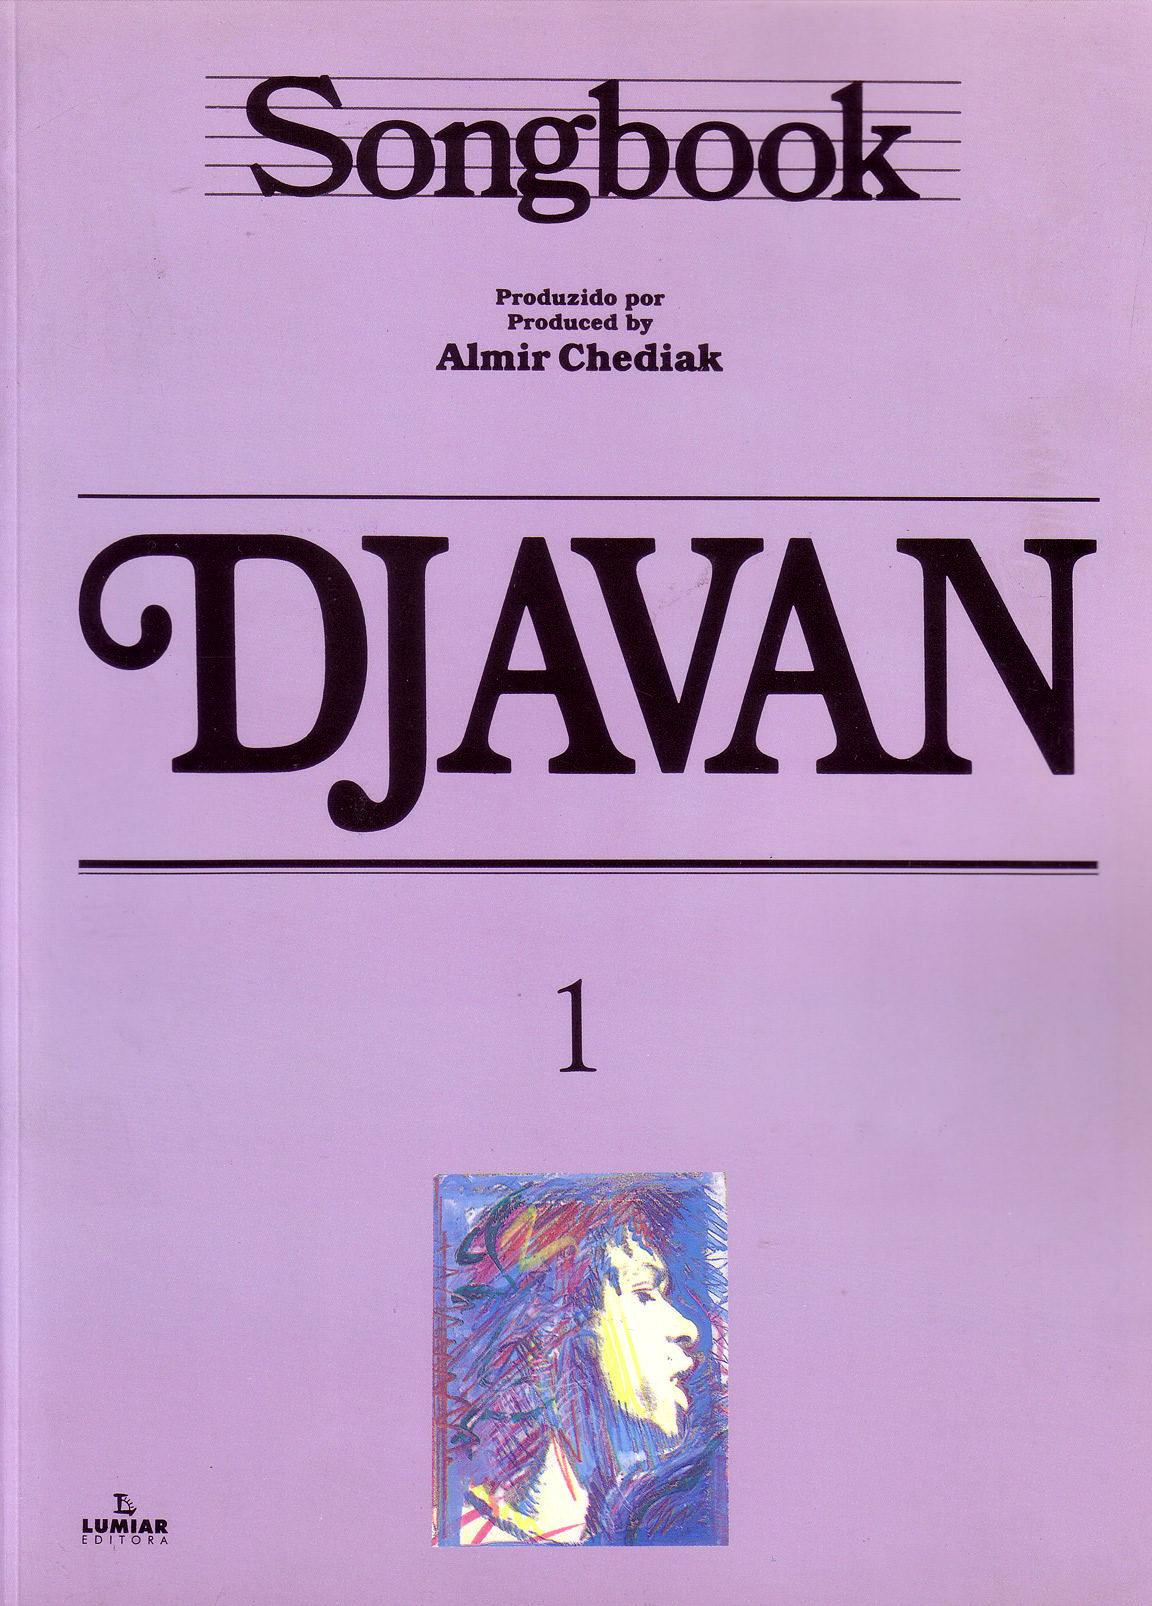 Songbook Vol 1 (Almir Chediak)